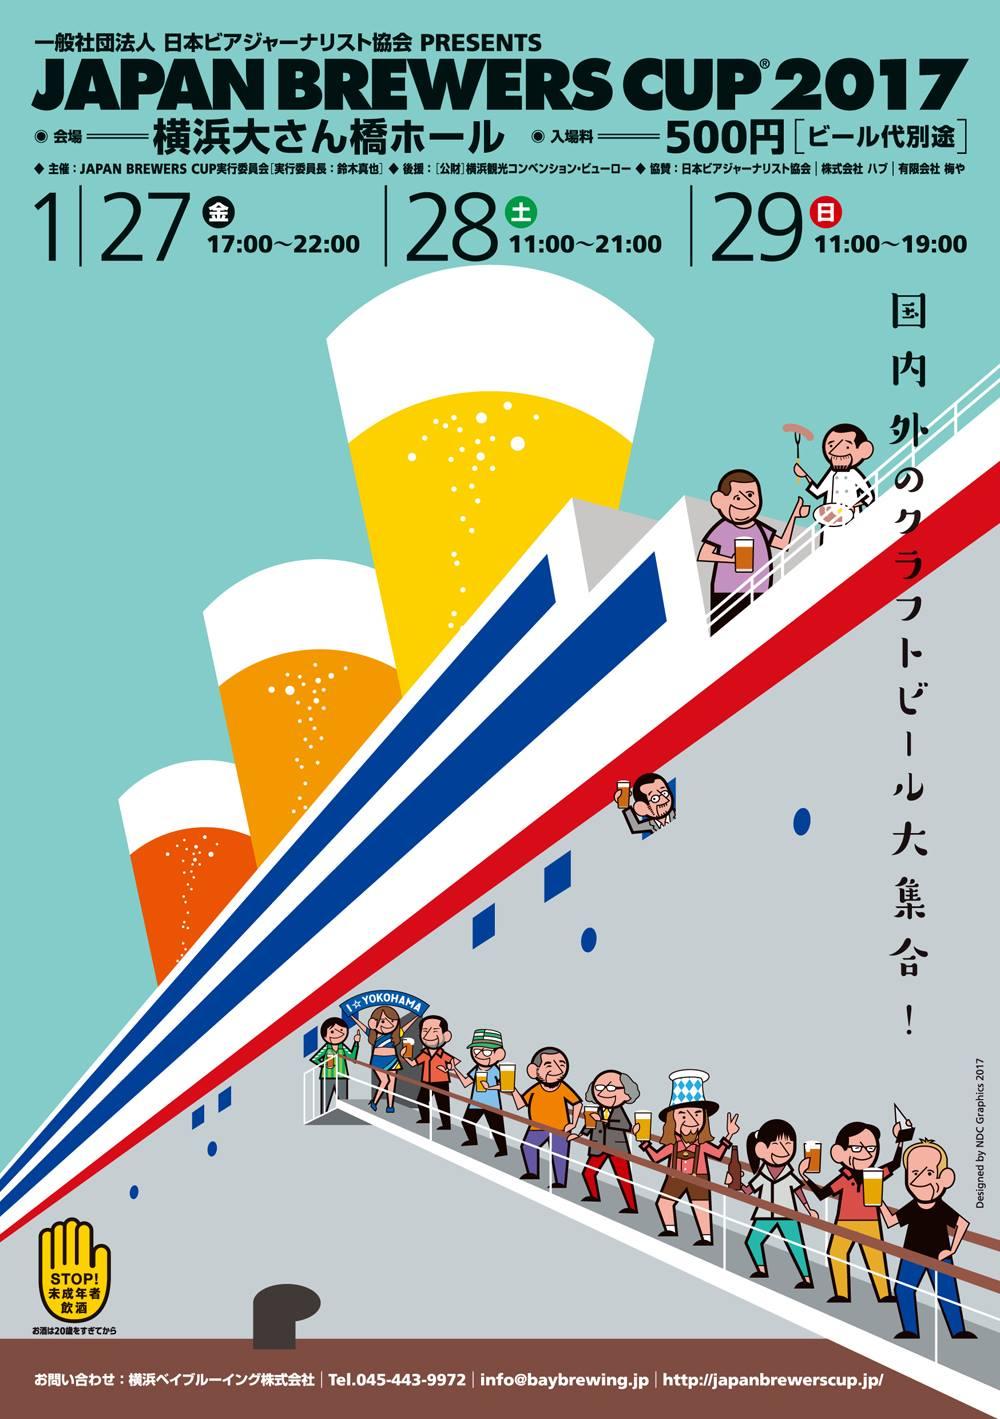 JAPAN BREWERS CUPオフィシャルサイト